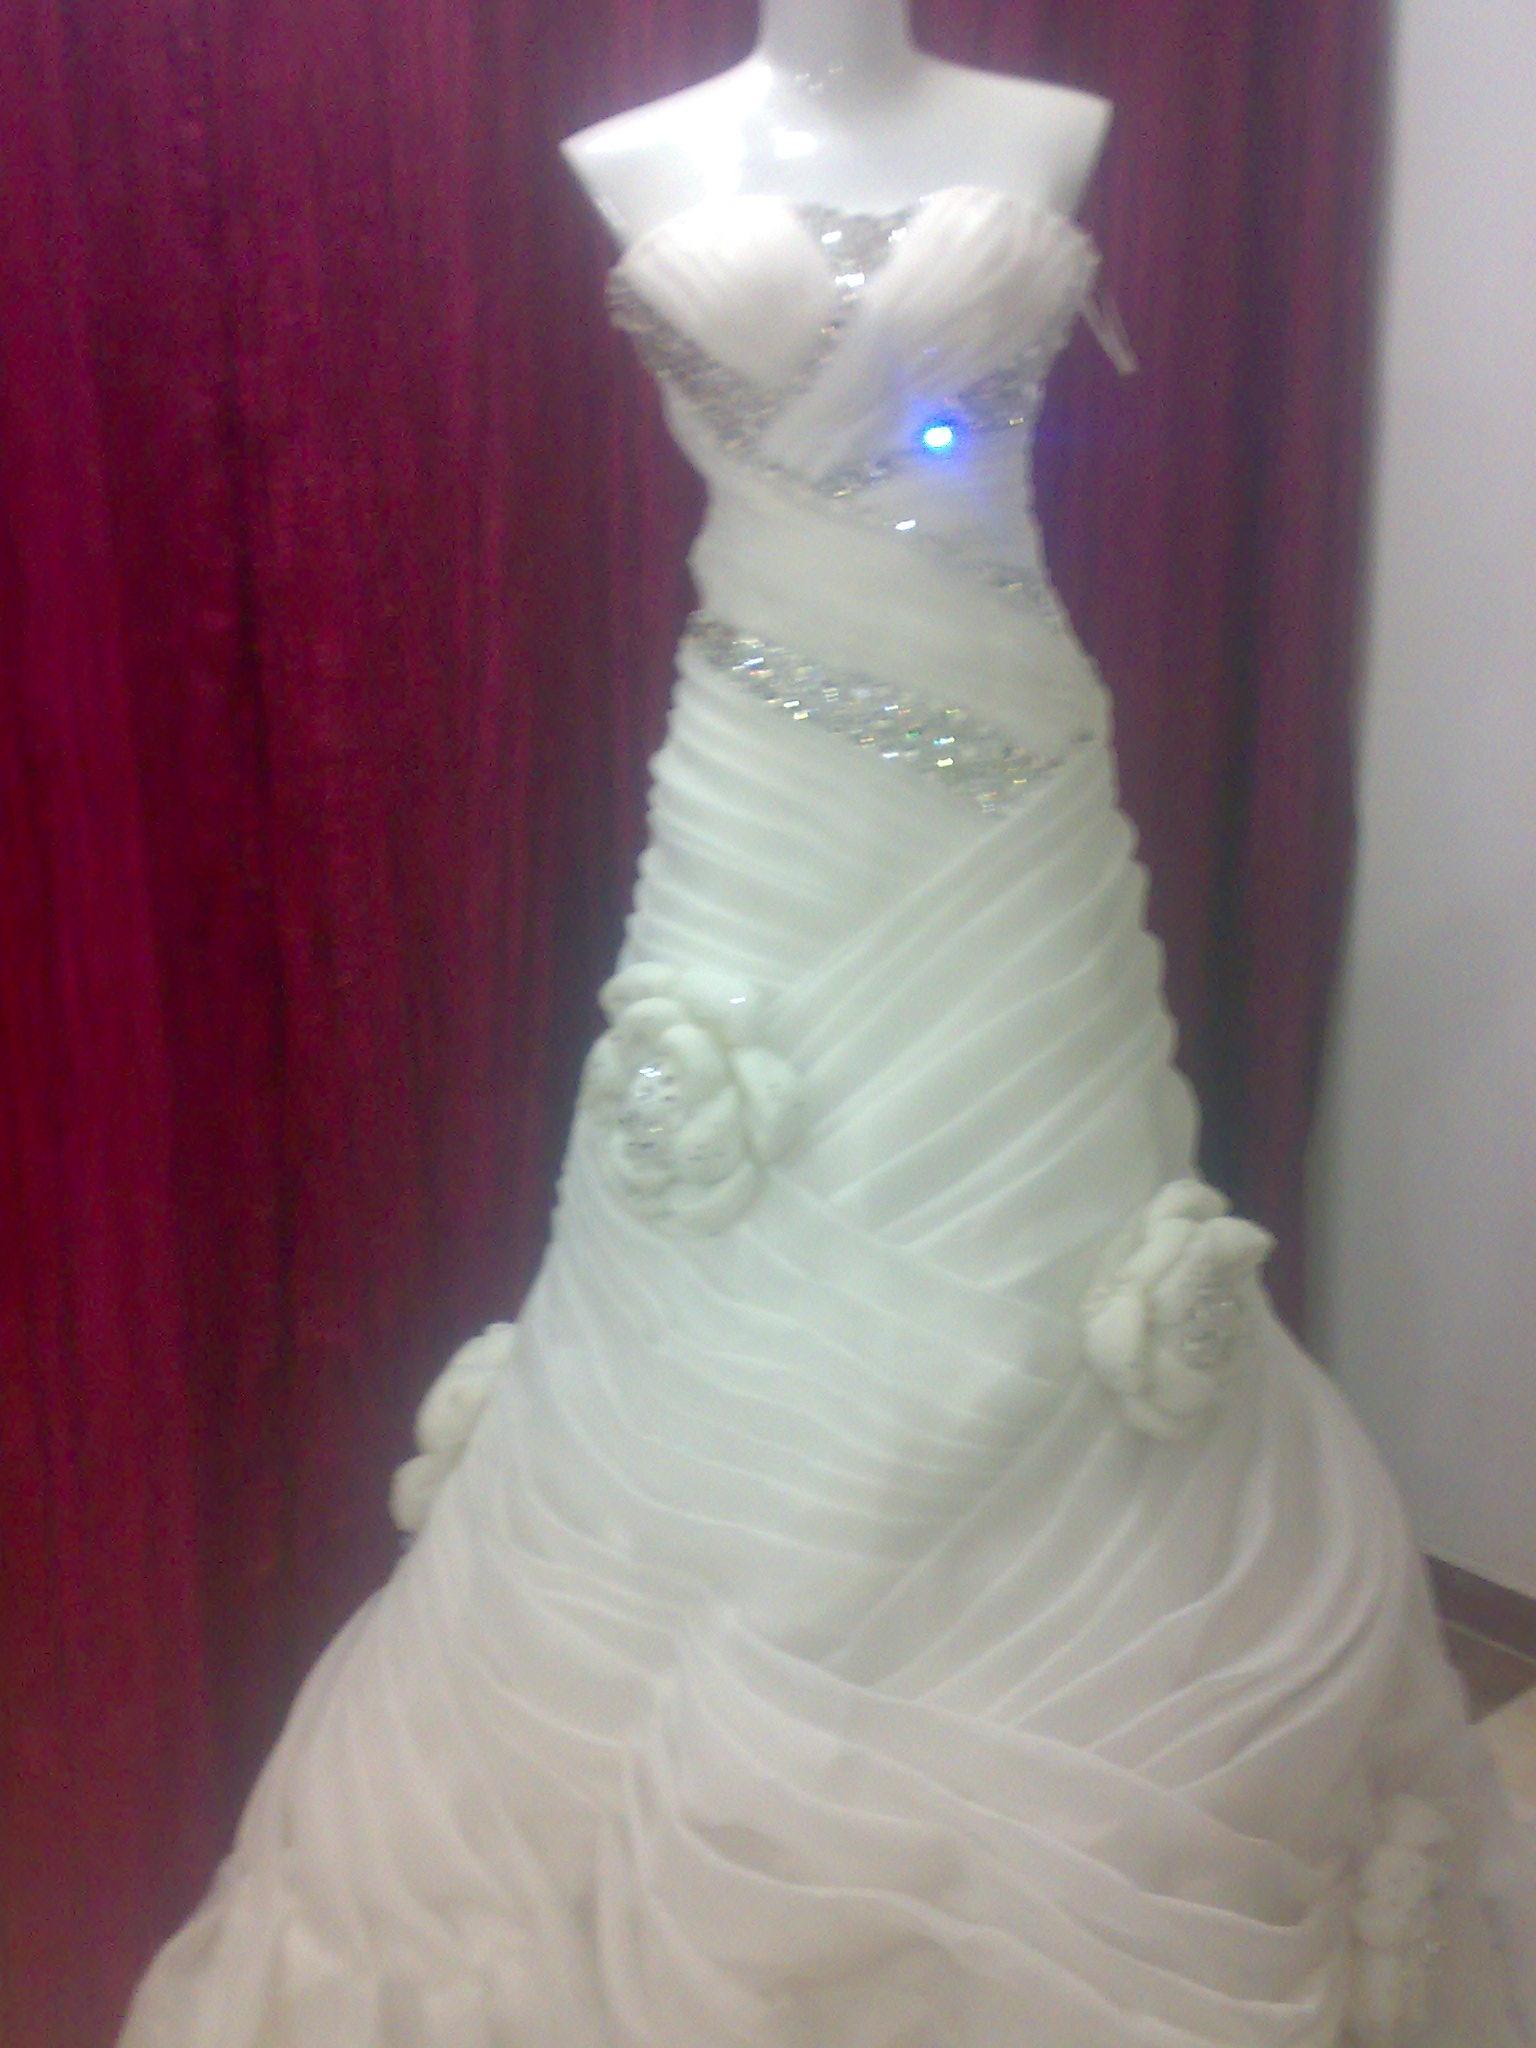 بالصور فساتين افراح للمحجبات , احلى فستان عروسه 1025 3